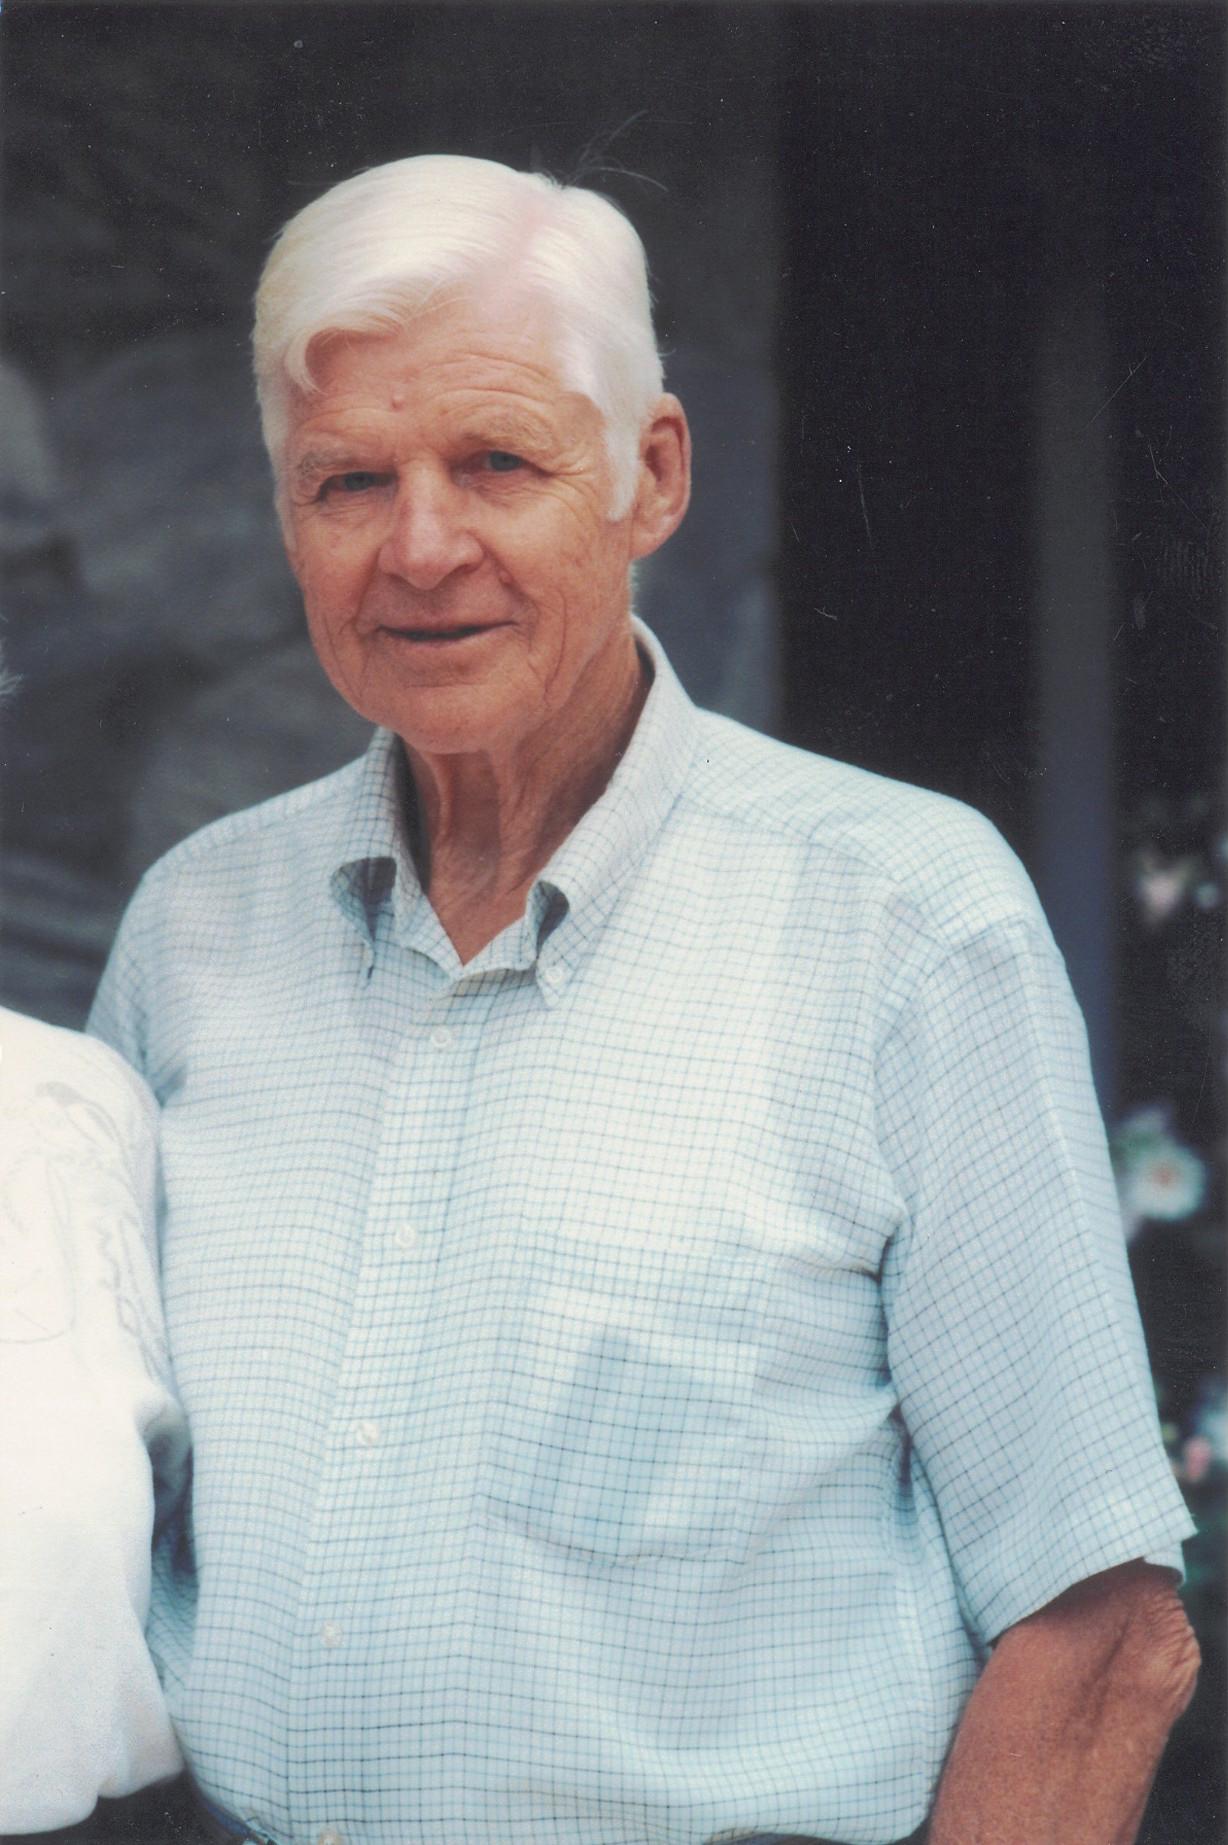 Sir Roy McKenzie